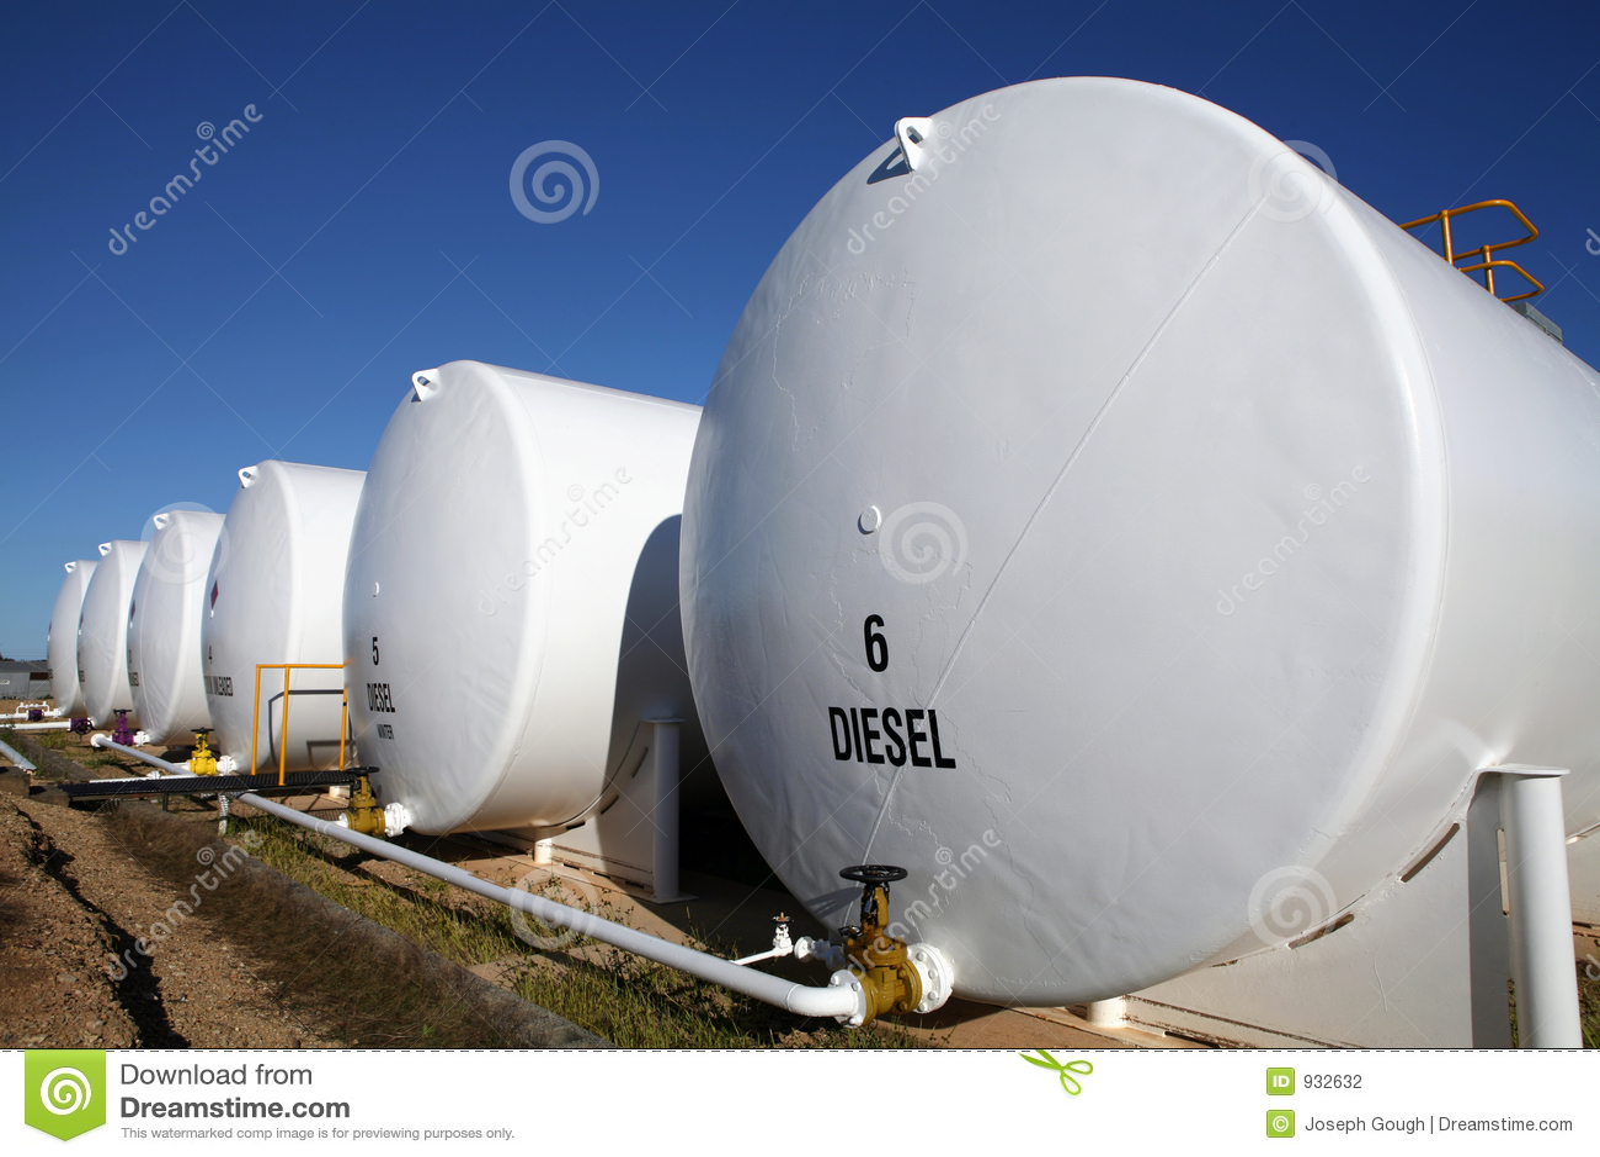 Diesel Fuel Prices & Trucking Industry